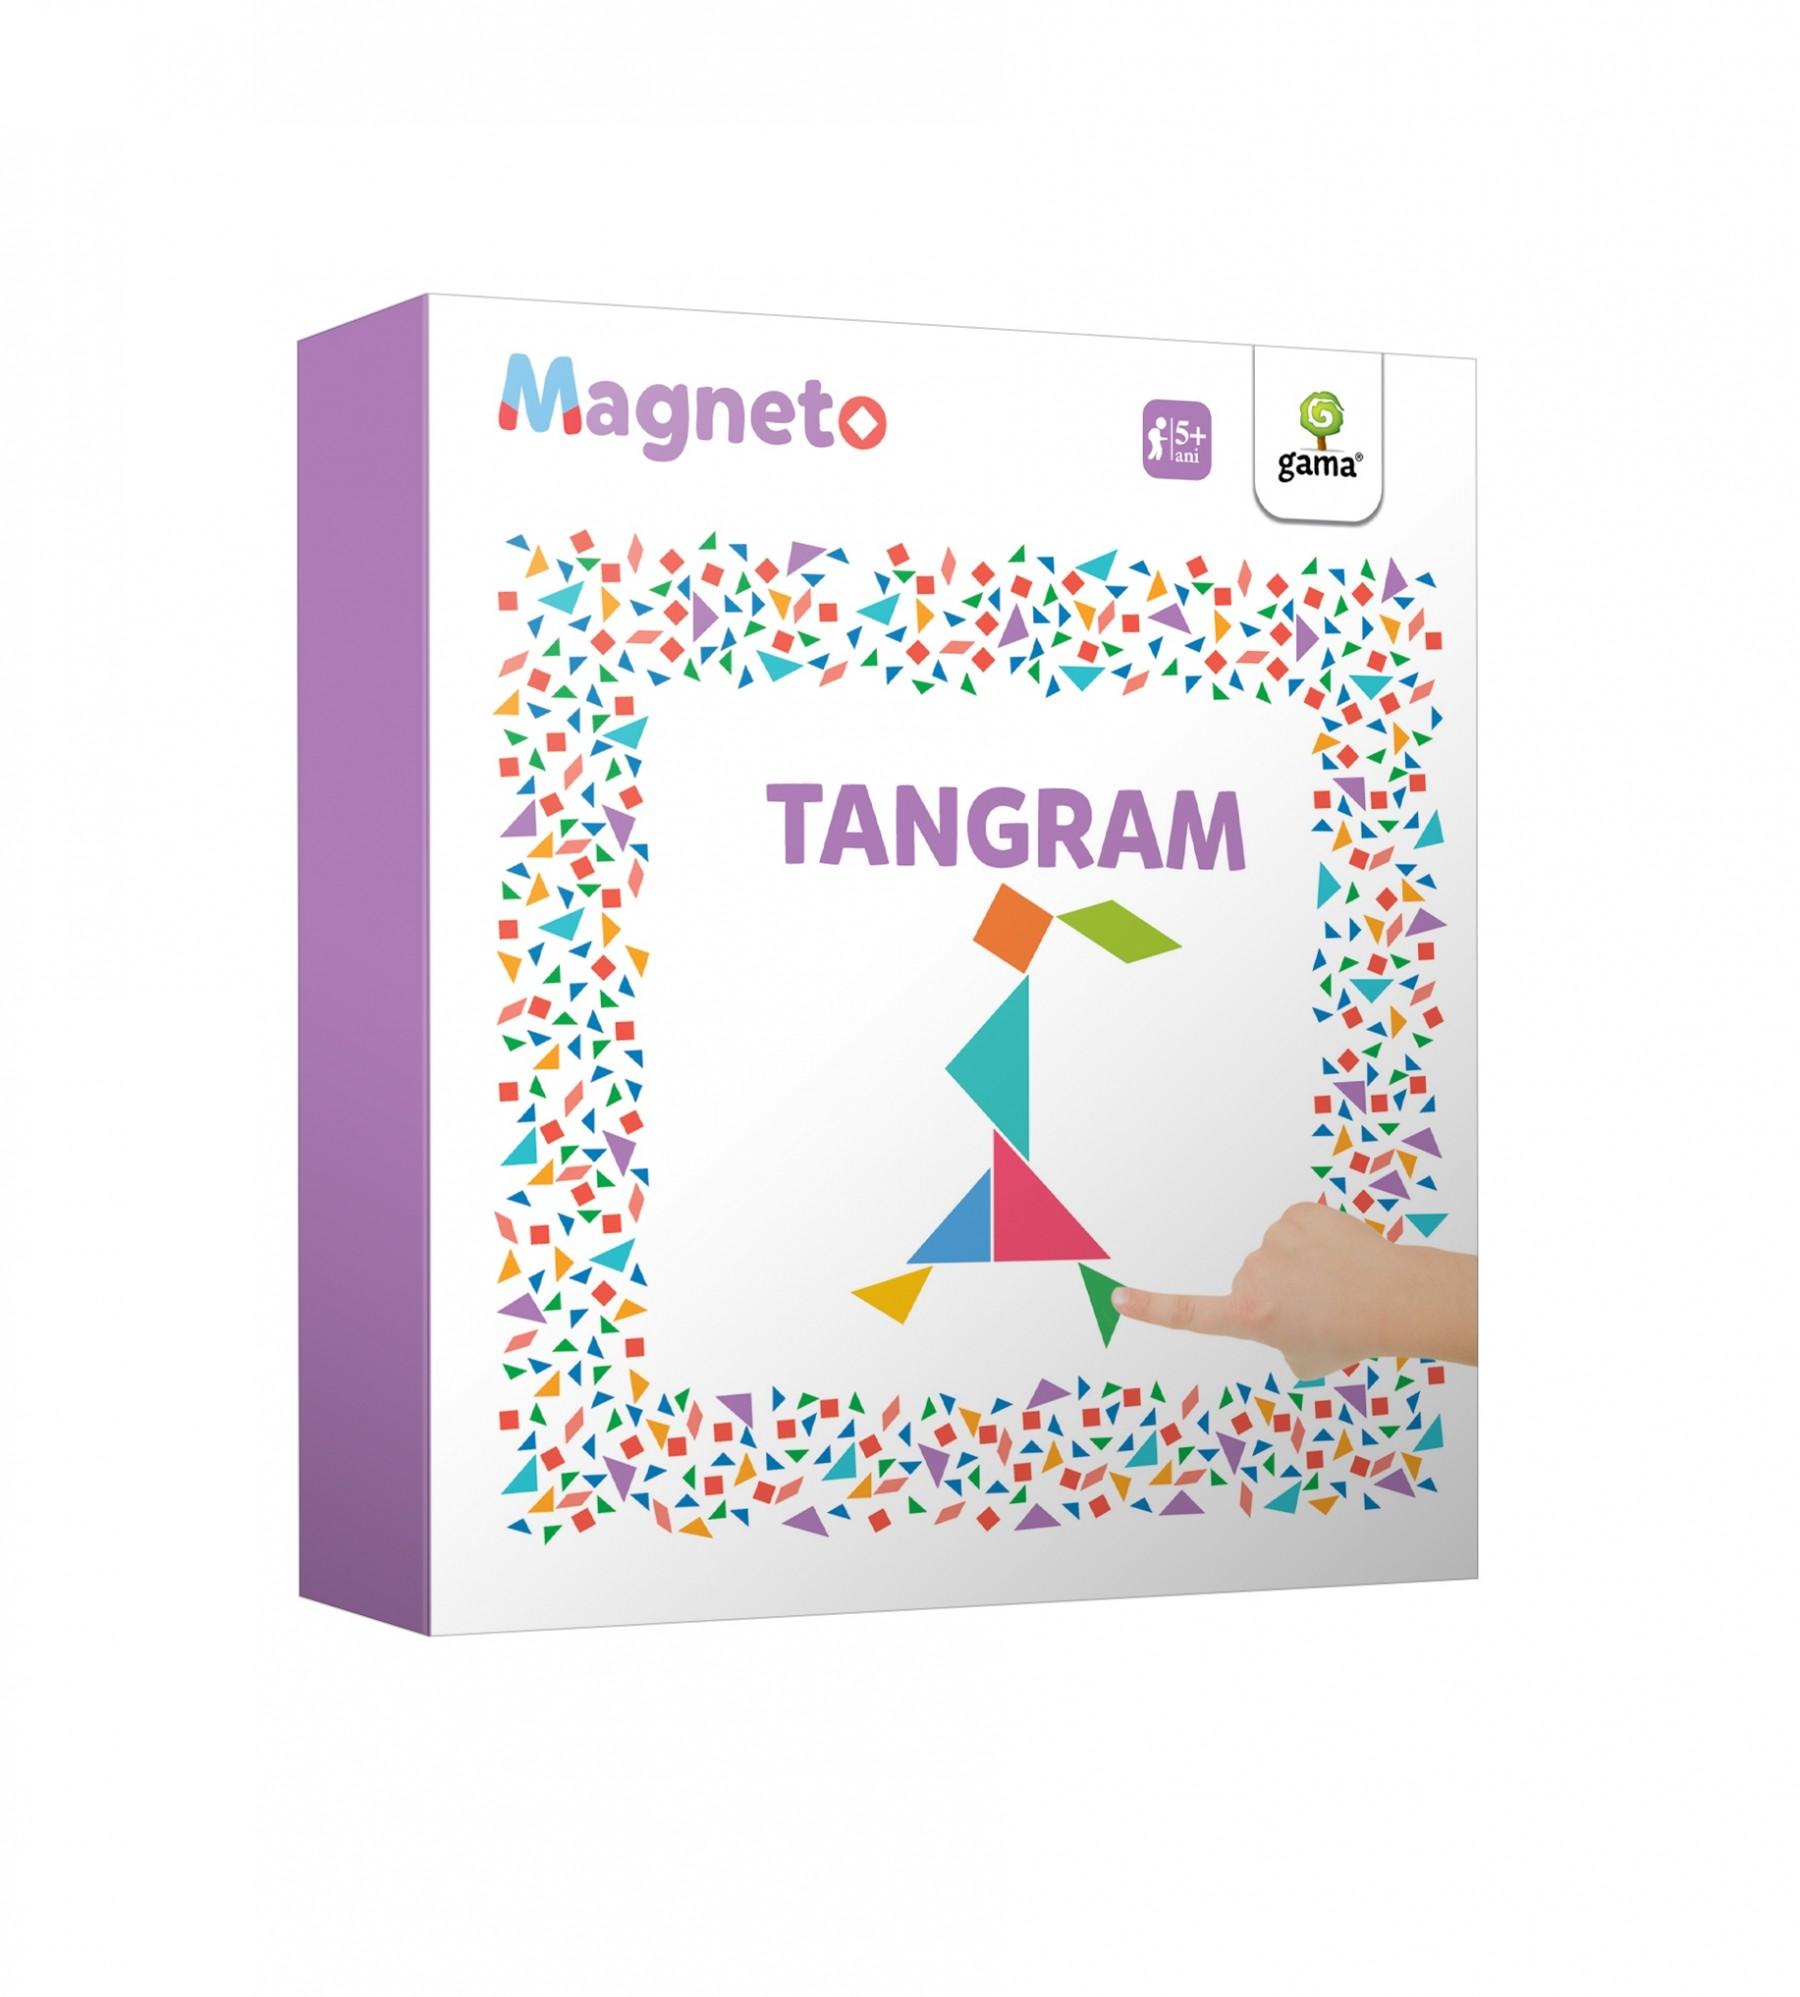 cutie_magneto_tangram